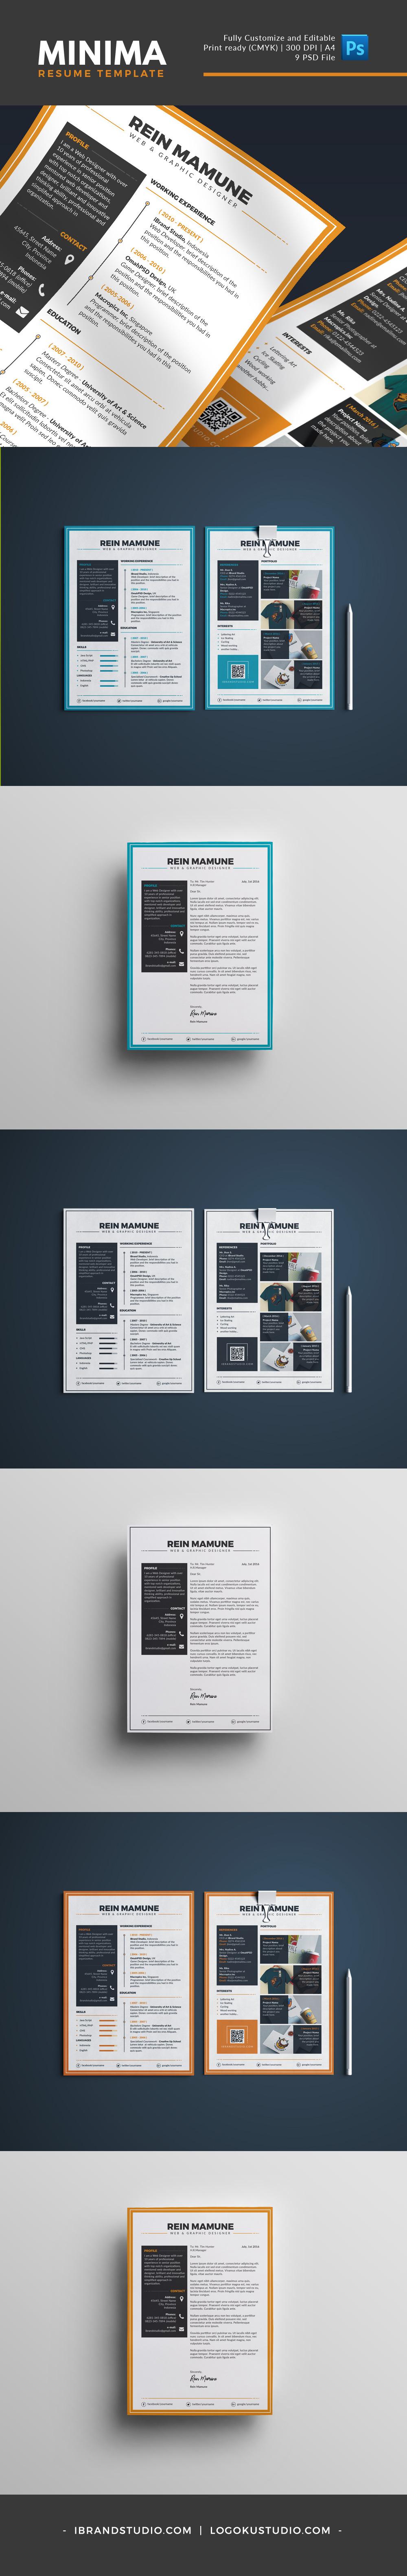 Free Minima Resume Template (3 Colors, PSD)